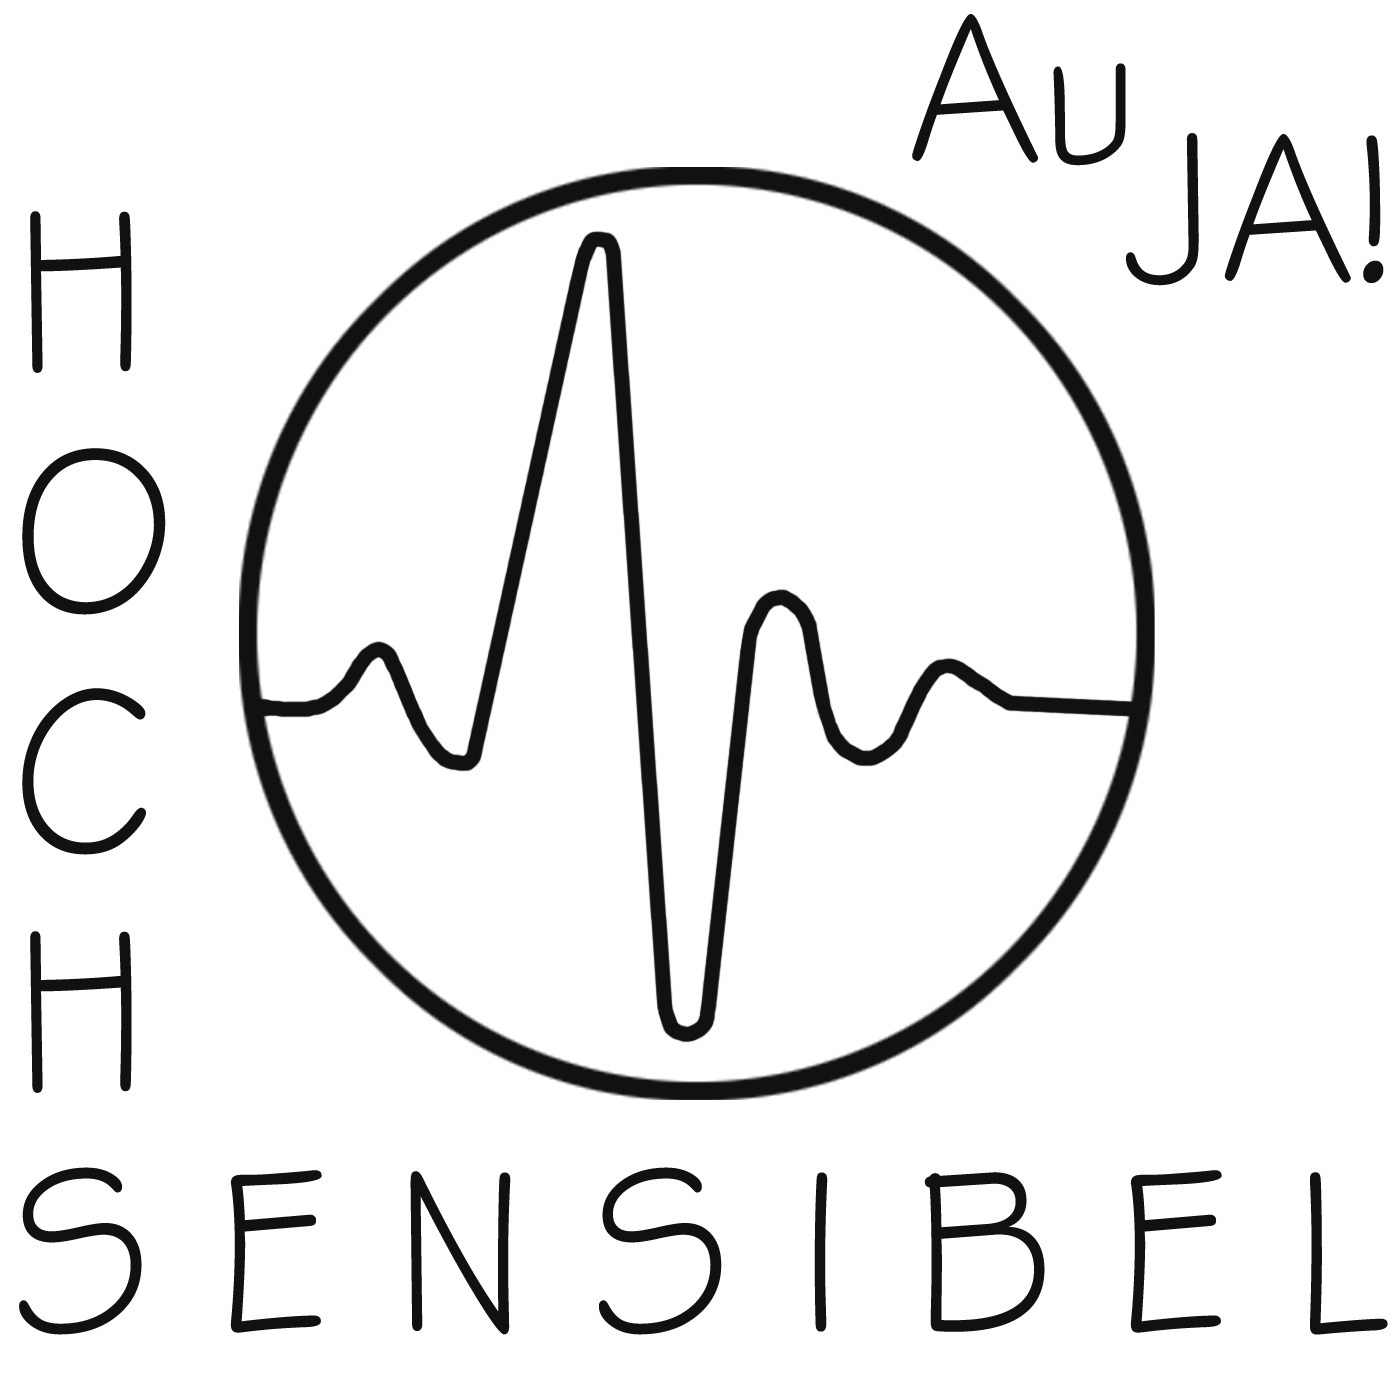 Artwork for # 1 Hochsensibel - Auja!